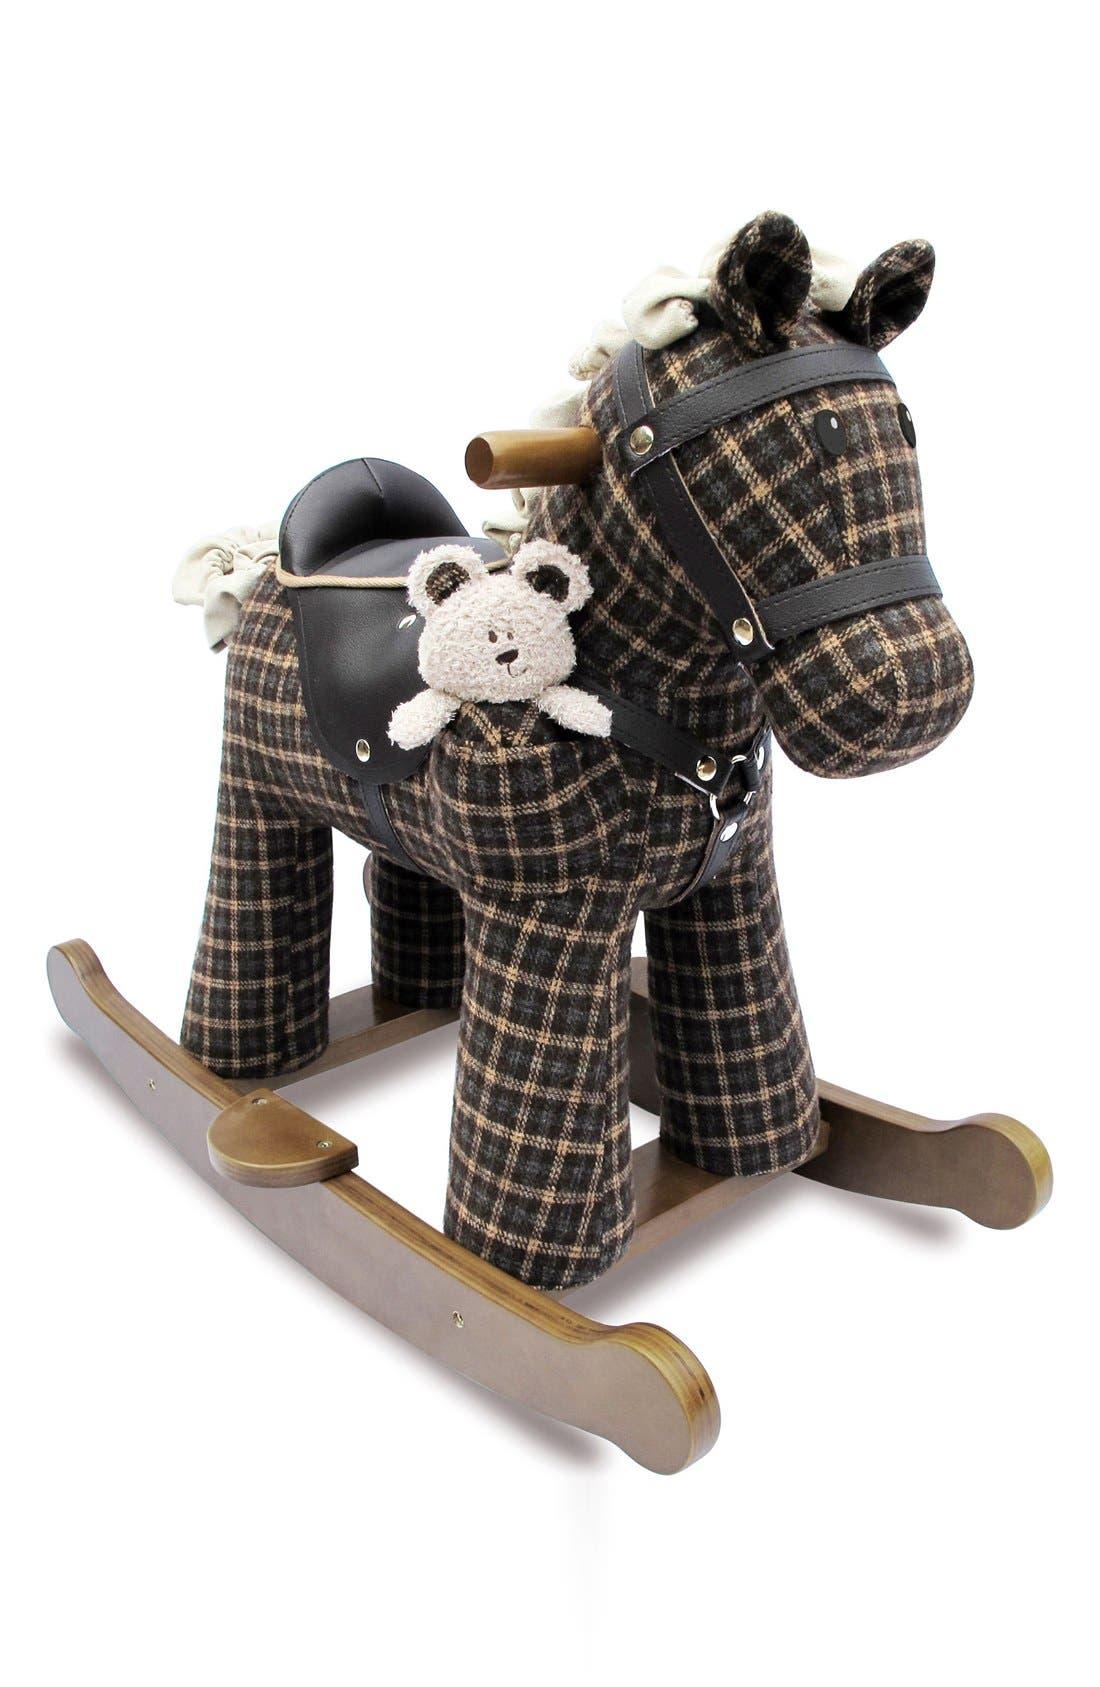 Rufus & Ted Rocking Horse & Stuffed Animal,                             Main thumbnail 1, color,                             200